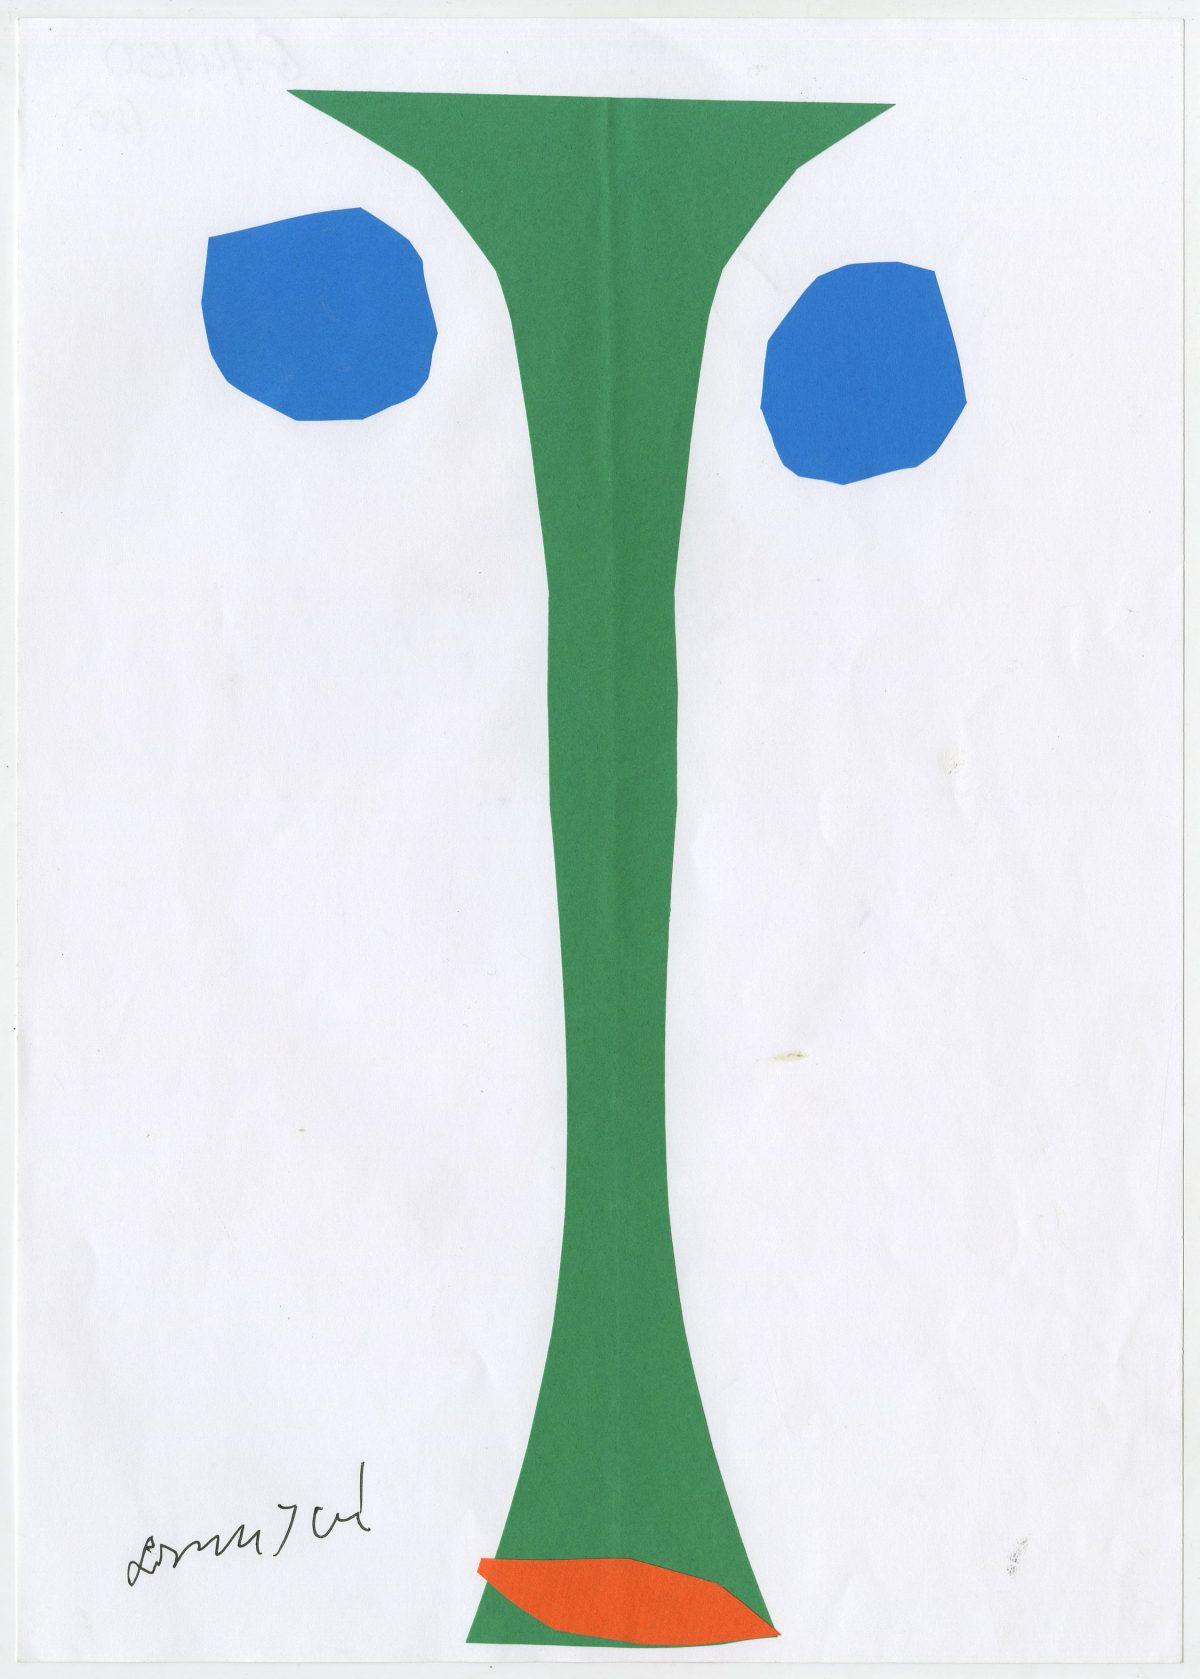 G14150(80)<br/> <b>Cím:</b> Matisse levele Munkácsynak … <br/> <b>Méret cm:</b> 29,6X21 <br/> <b>Készült:</b> 2005. <br/> <b>Technika:</b> kollázs<br/>